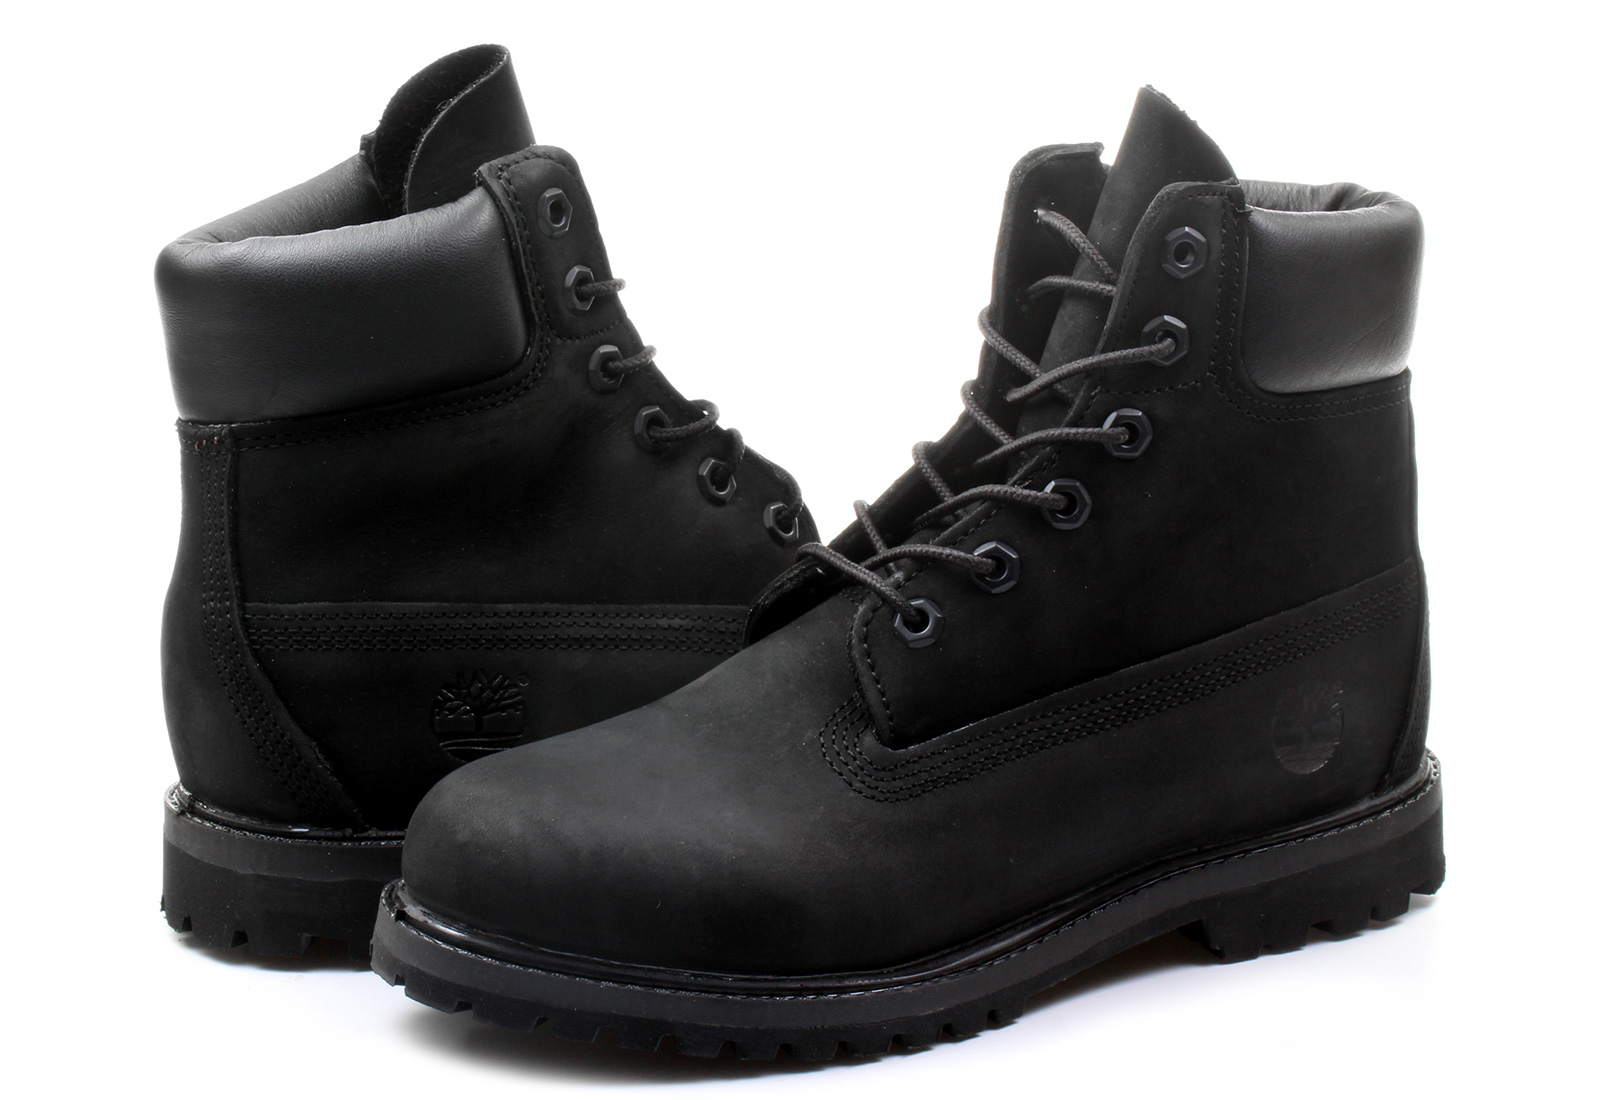 Timberland Boty - 6 Inch Prem Boot - 8658A-BLKTenisky 6fac2f60cf